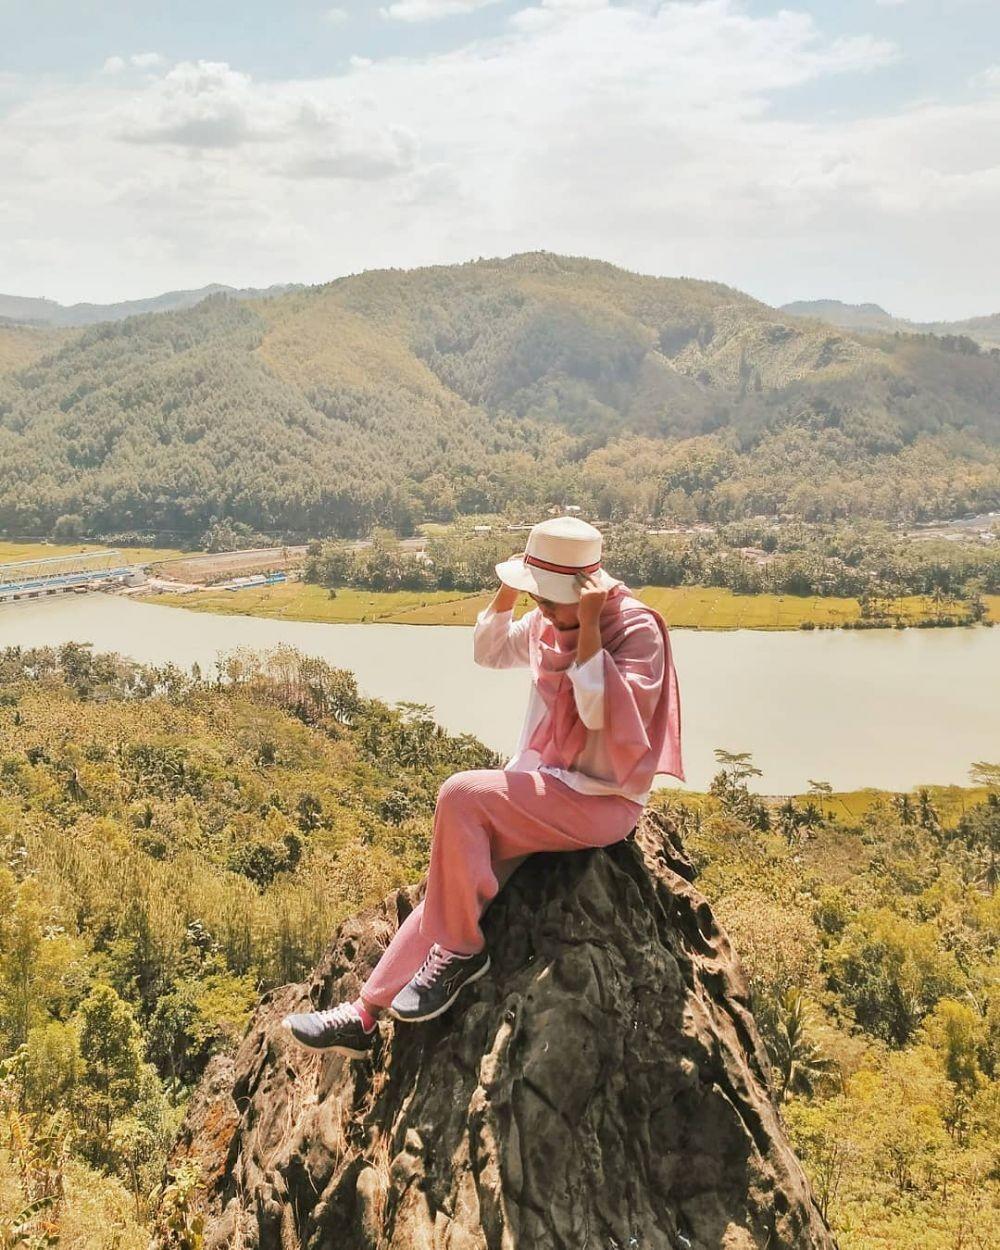 10 Tempat Wisata di Purwokerto, Surga Tersembunyi di Tanah Jawa